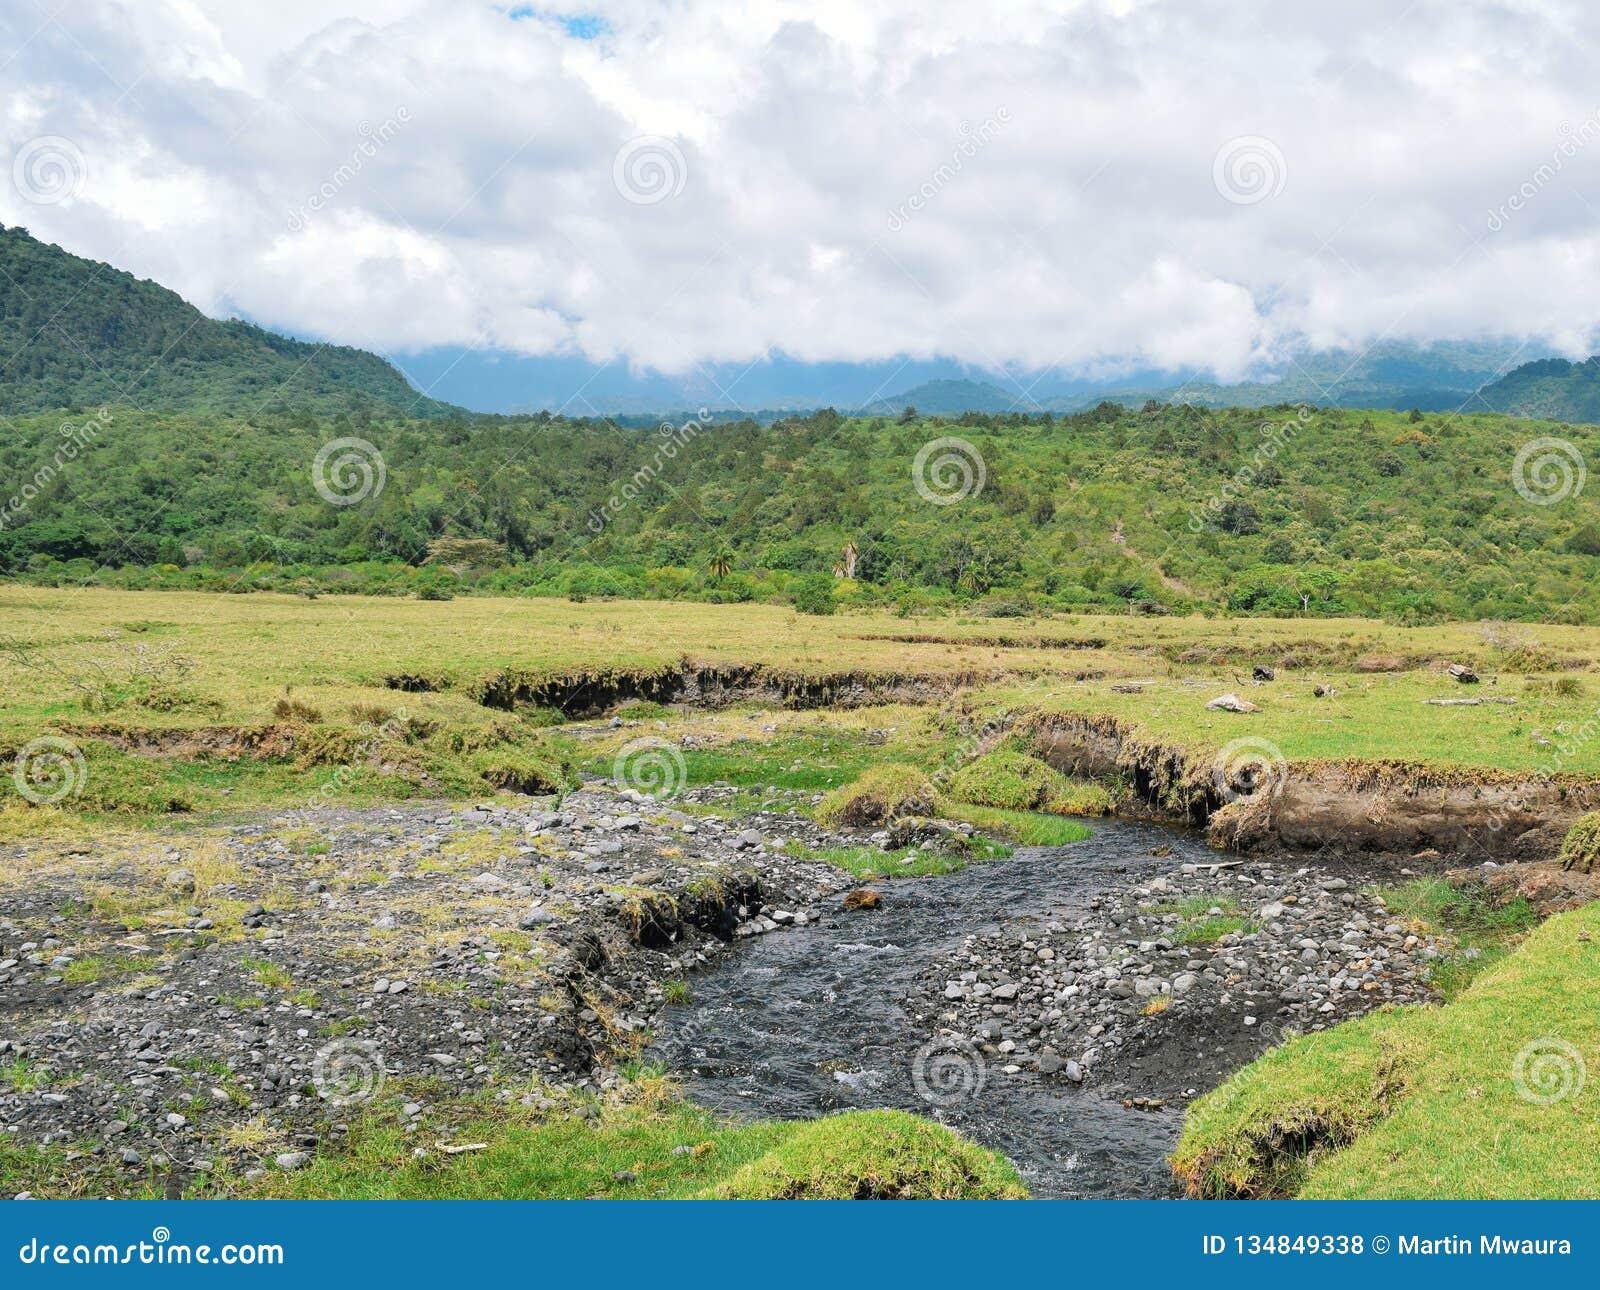 A fresh water river against a mountain background, Mount Meru, Tanzania